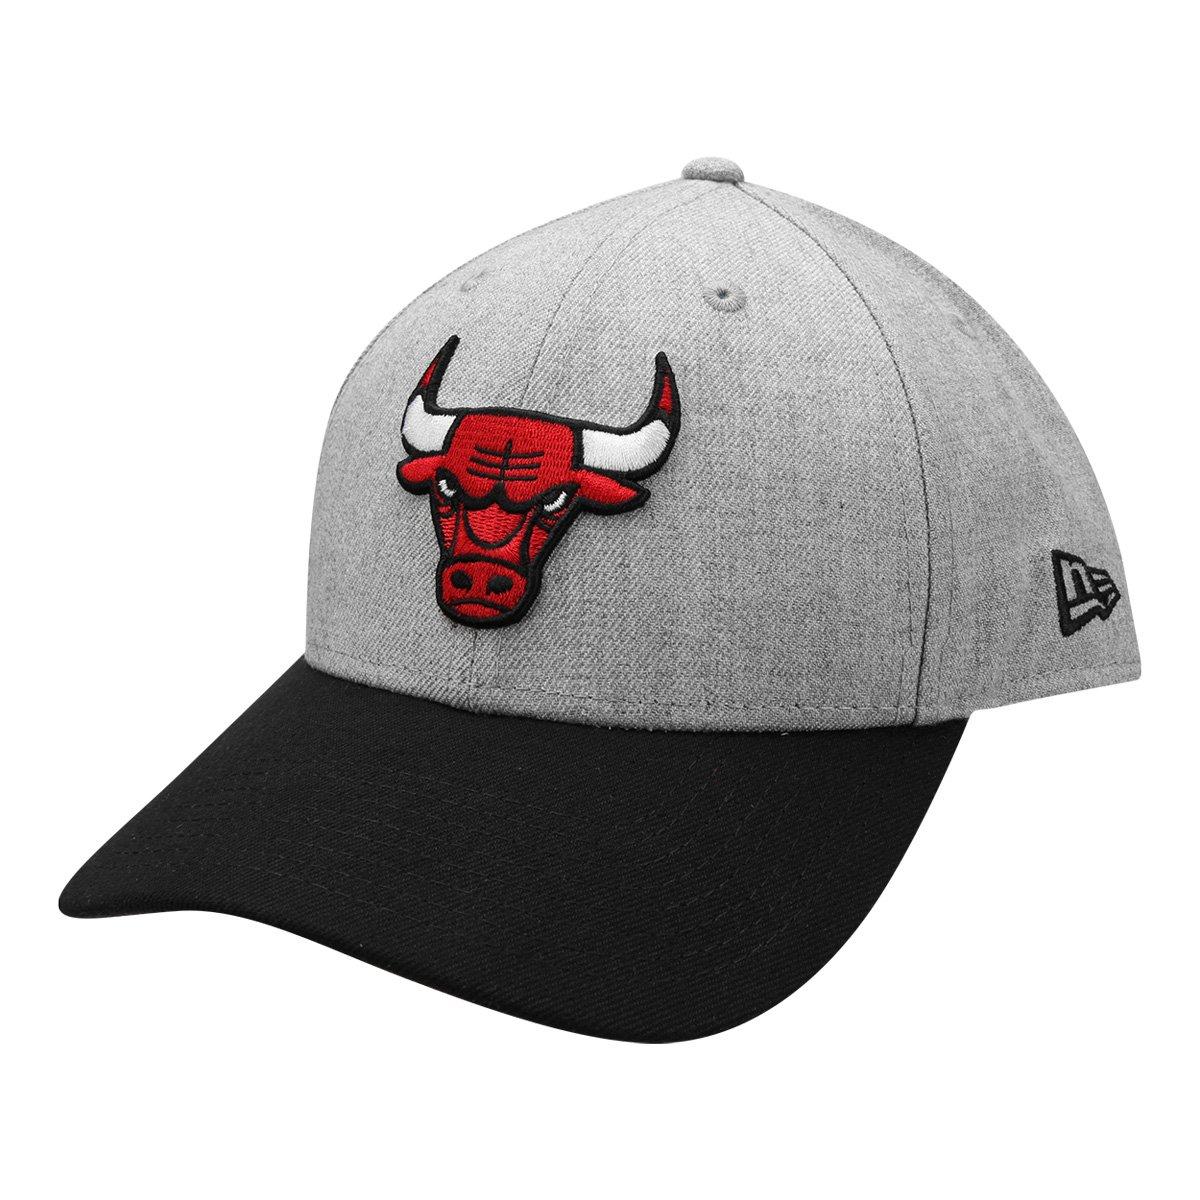 49f48ab9efcde Boné New Era NBA 940 Hc Sn Heather Chicago Bulls - Compre Agora ...